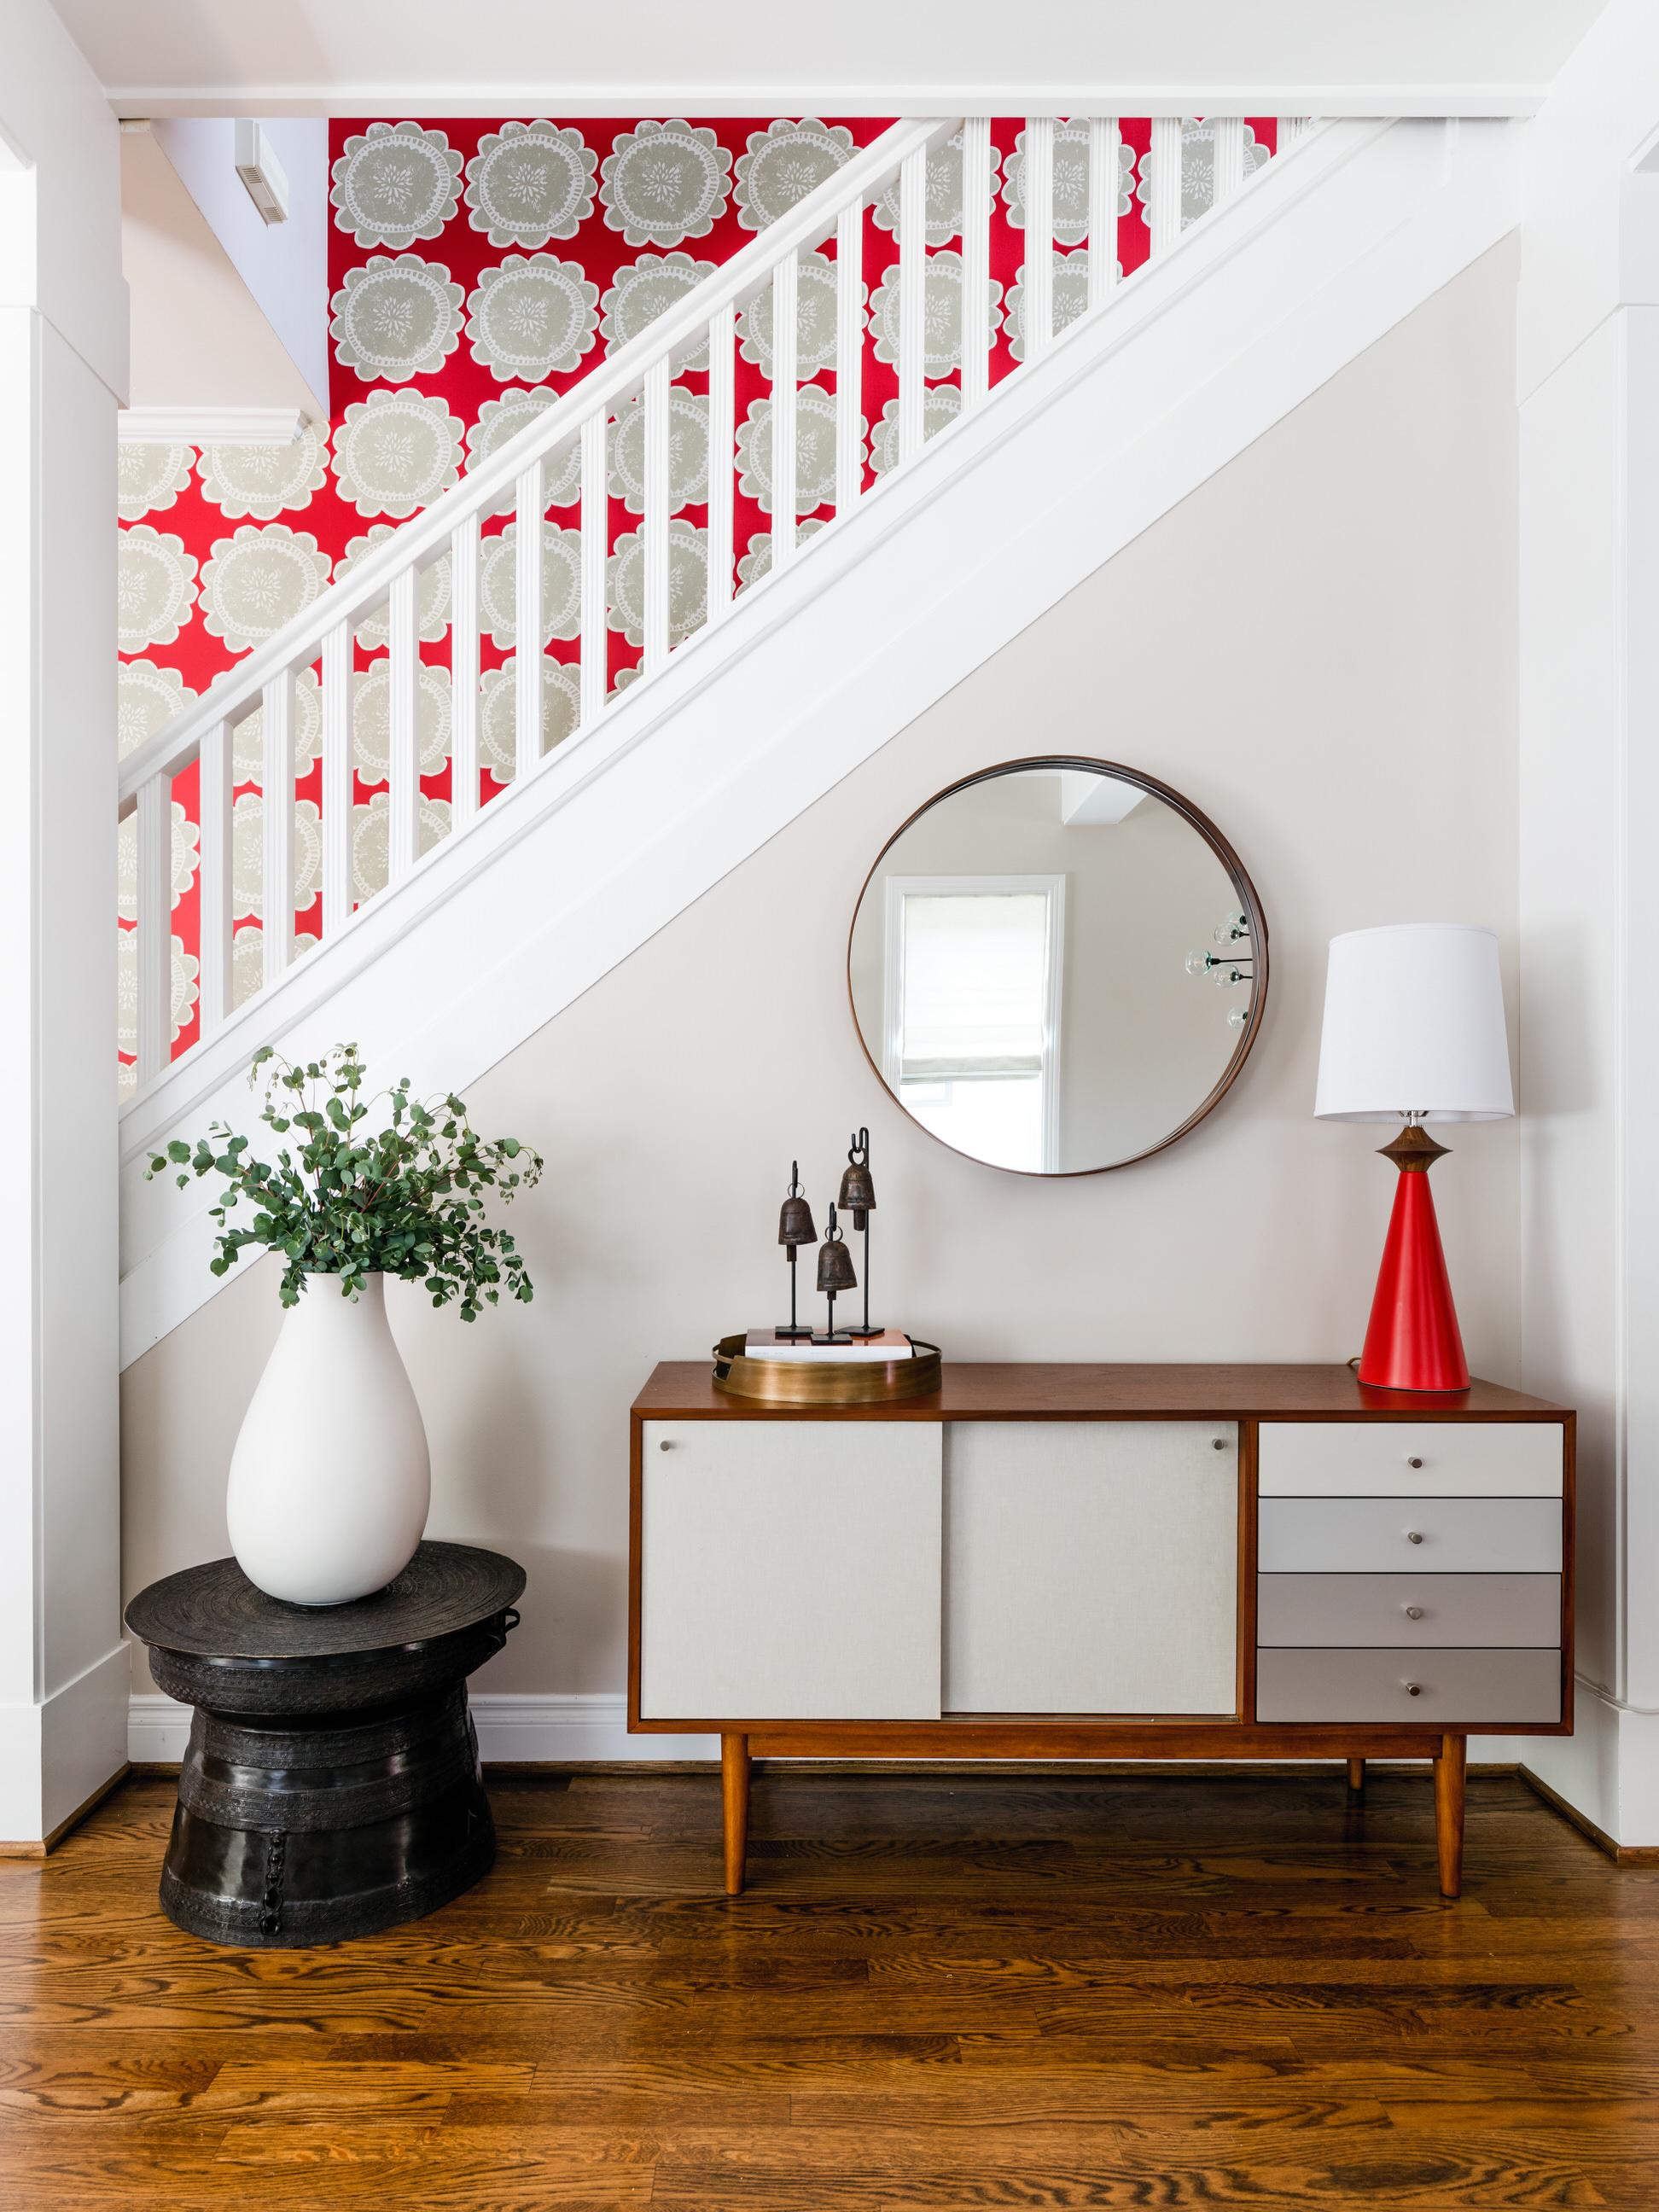 0001-Miranda-Estes-Photography-The-Residency-Bureau-Wallingford-20190515.jpg